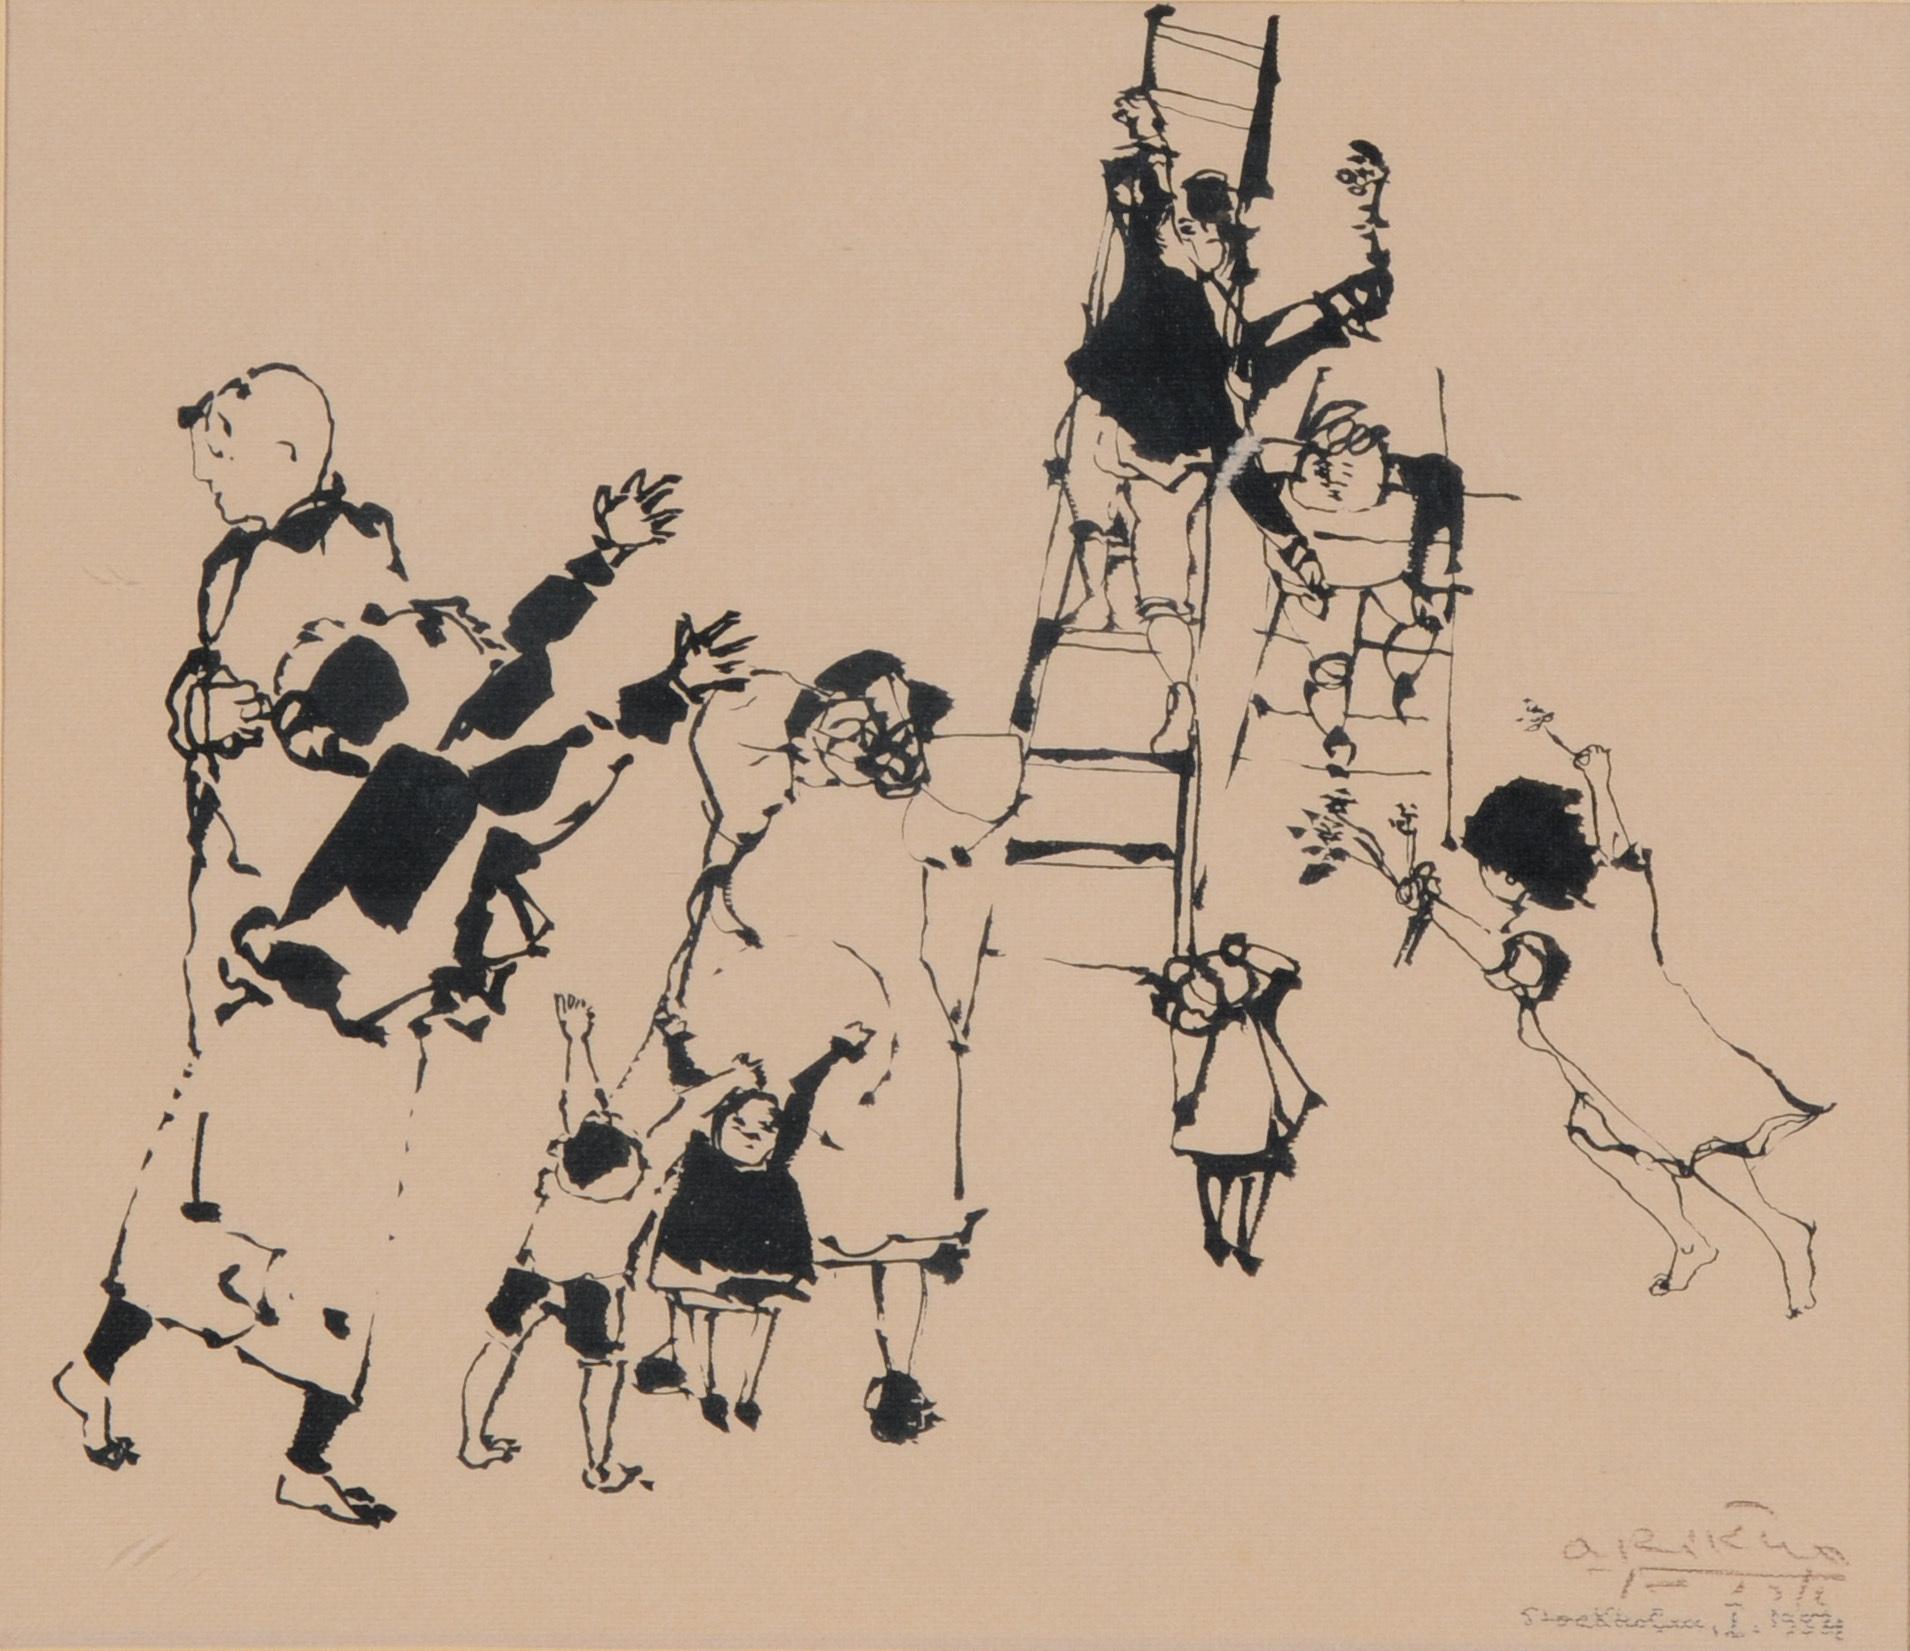 Arikha Avigdor, Untitled